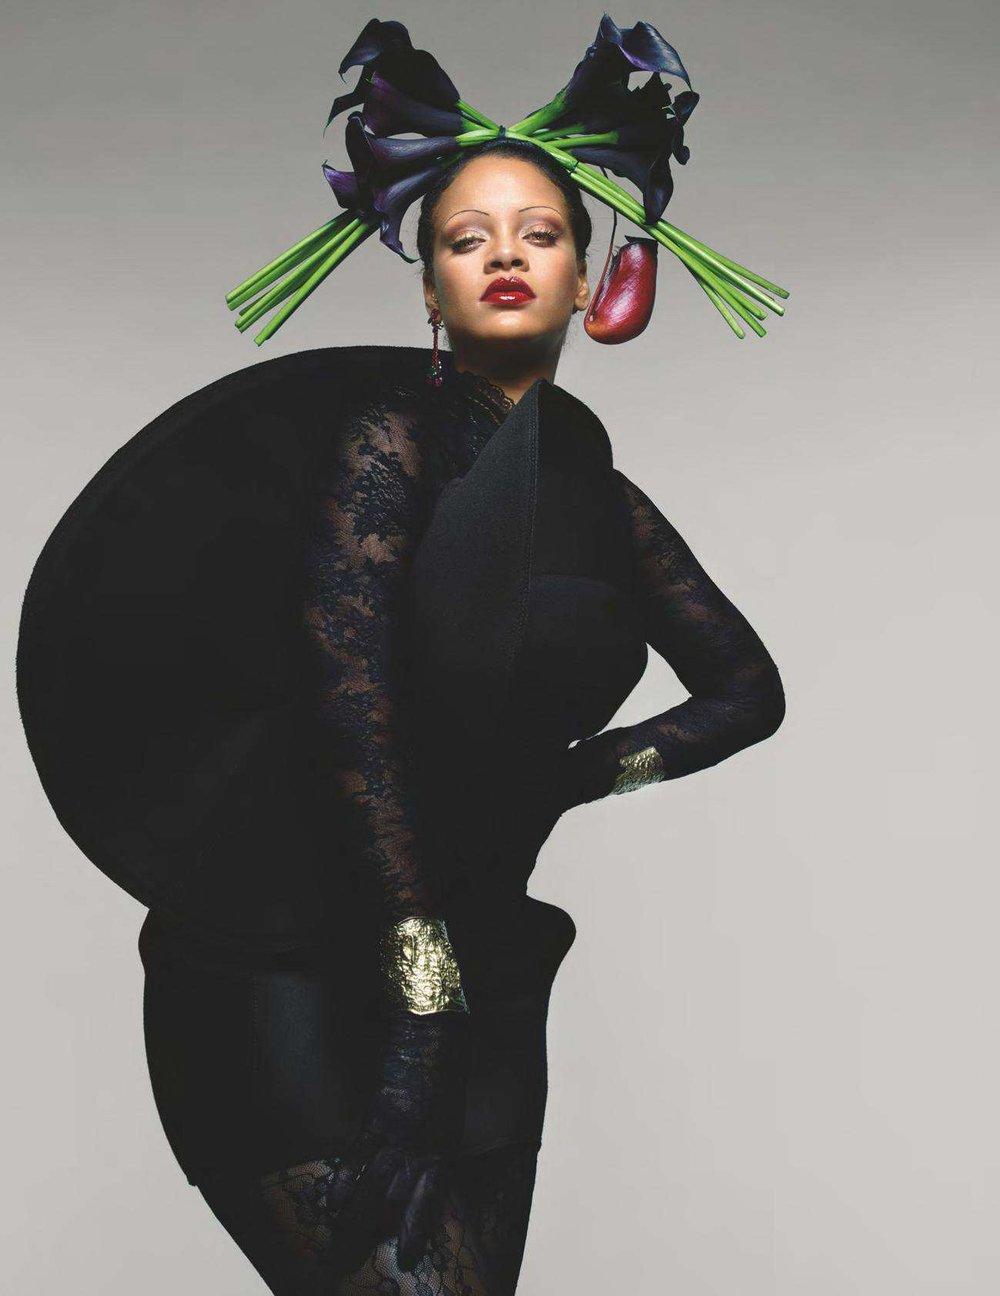 Rihanna by Nick Knight in Vogue UK Sept 2018 (5).jpg